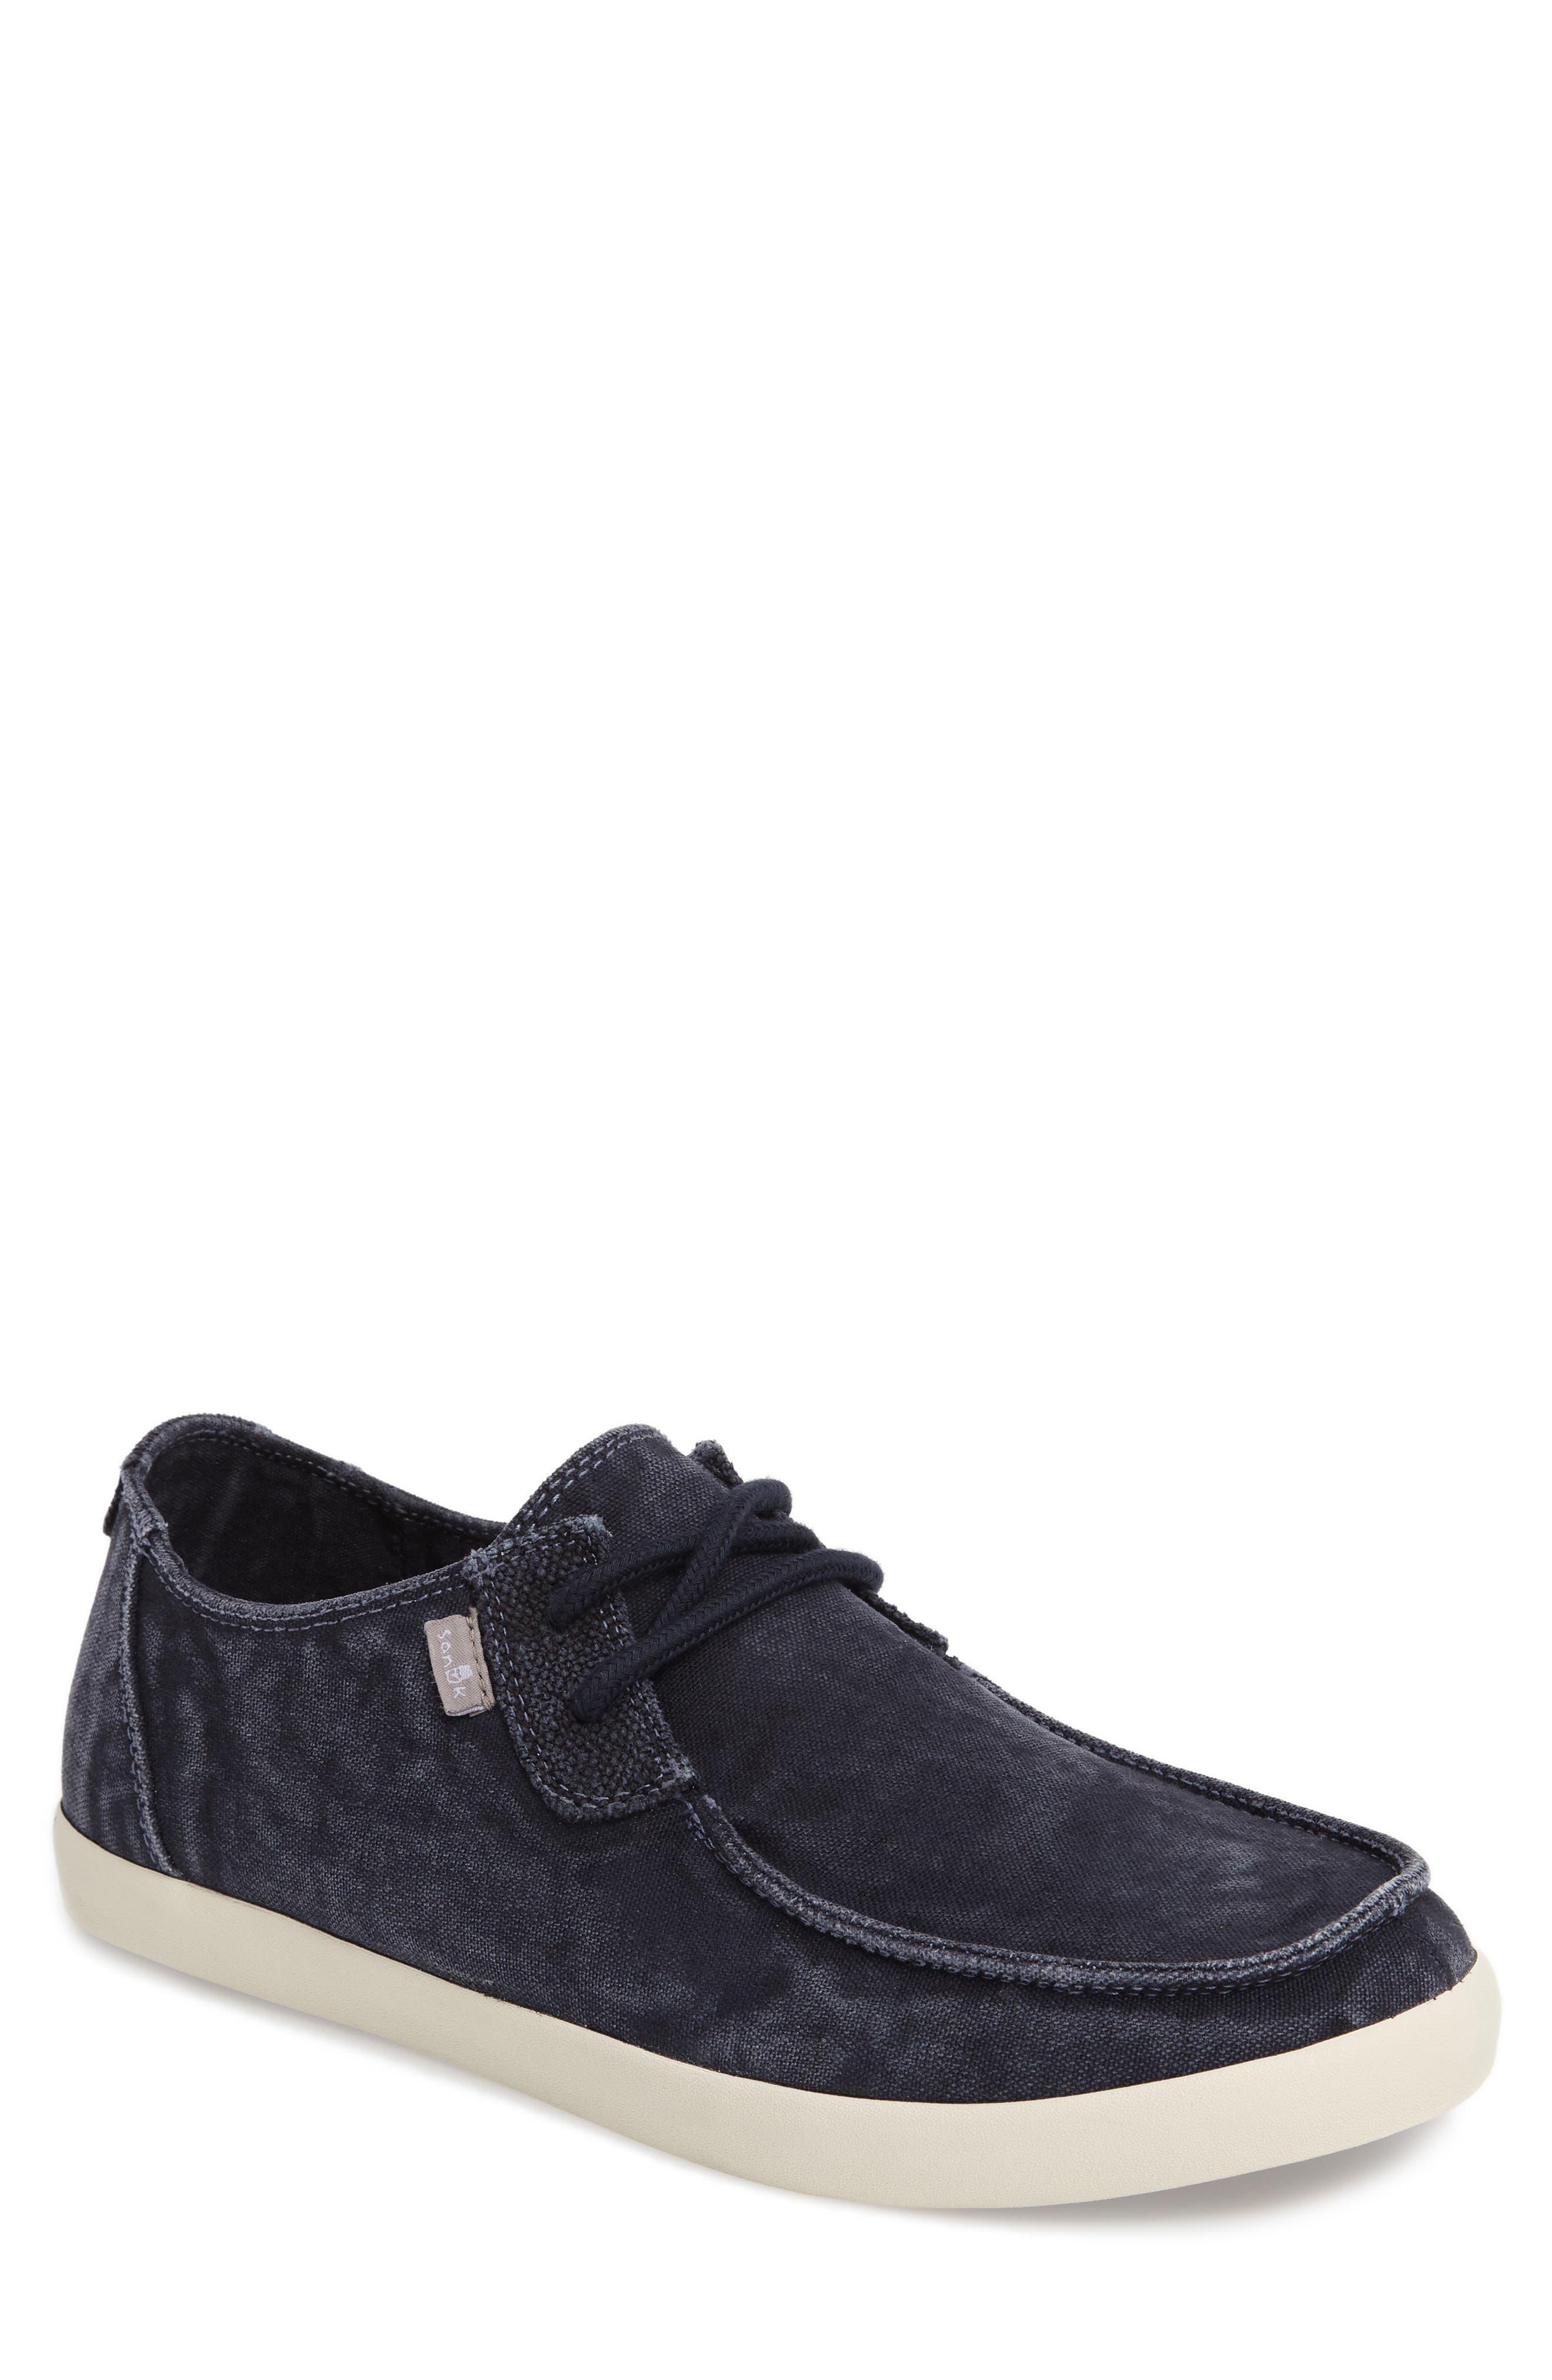 Alternate Image 1 Selected - Sanuk Numami Sneaker (Men)